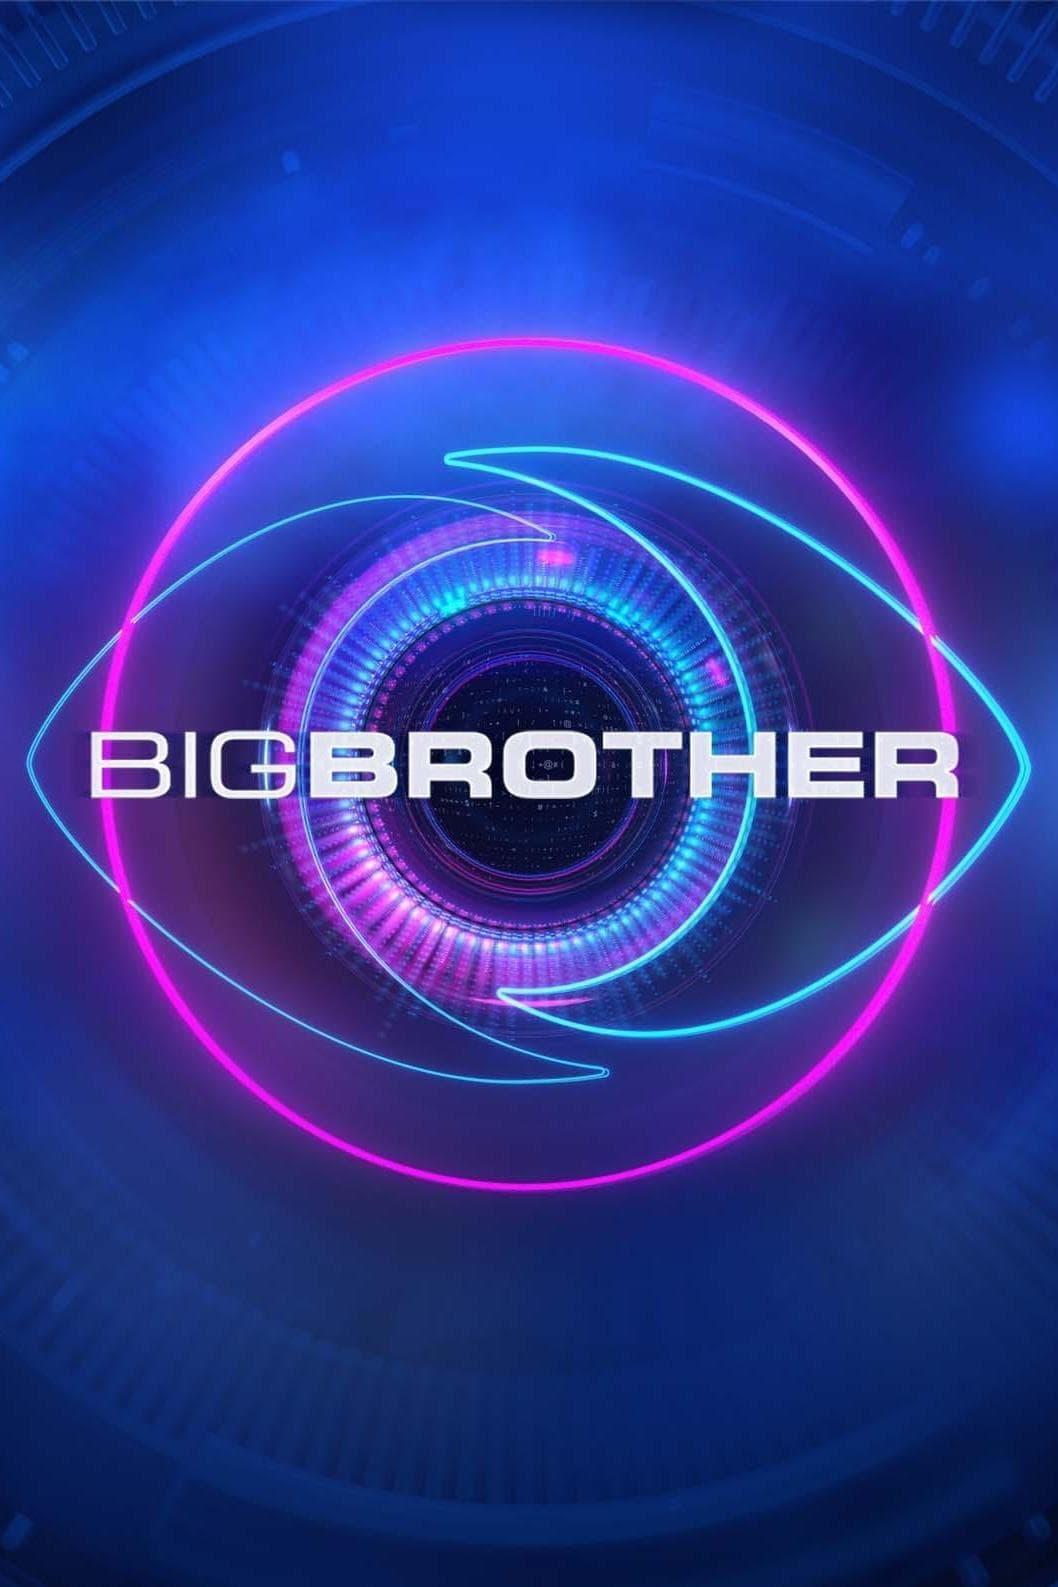 Big Brother Season 8